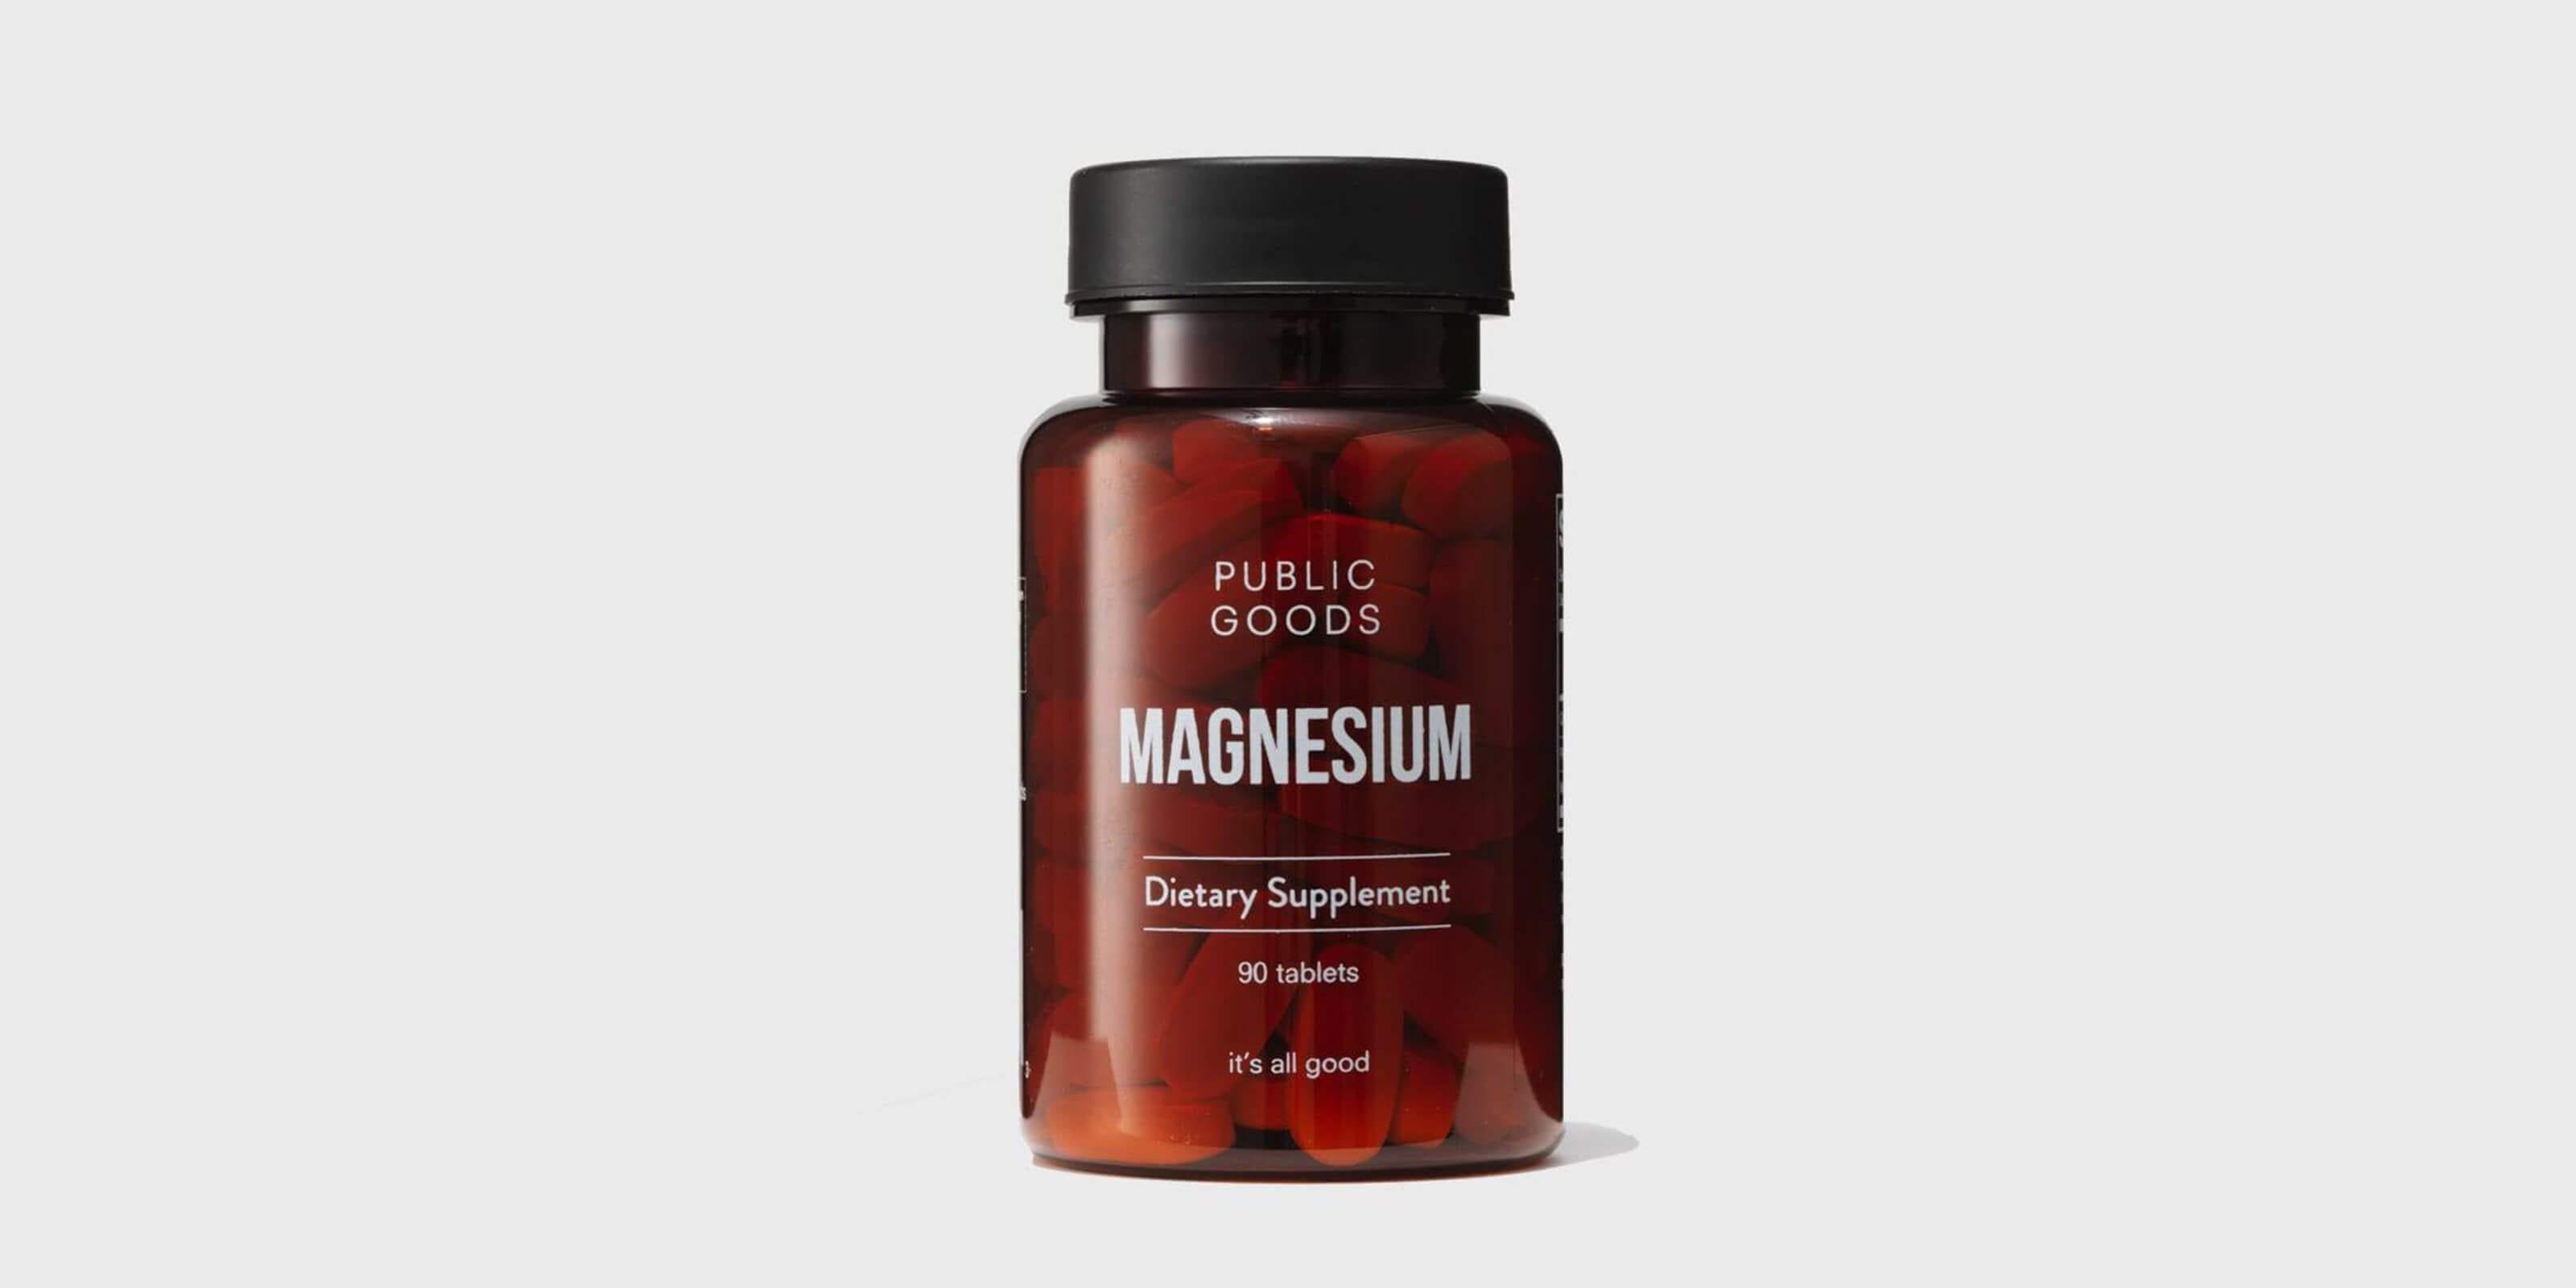 public goods magnesium supplement bottle